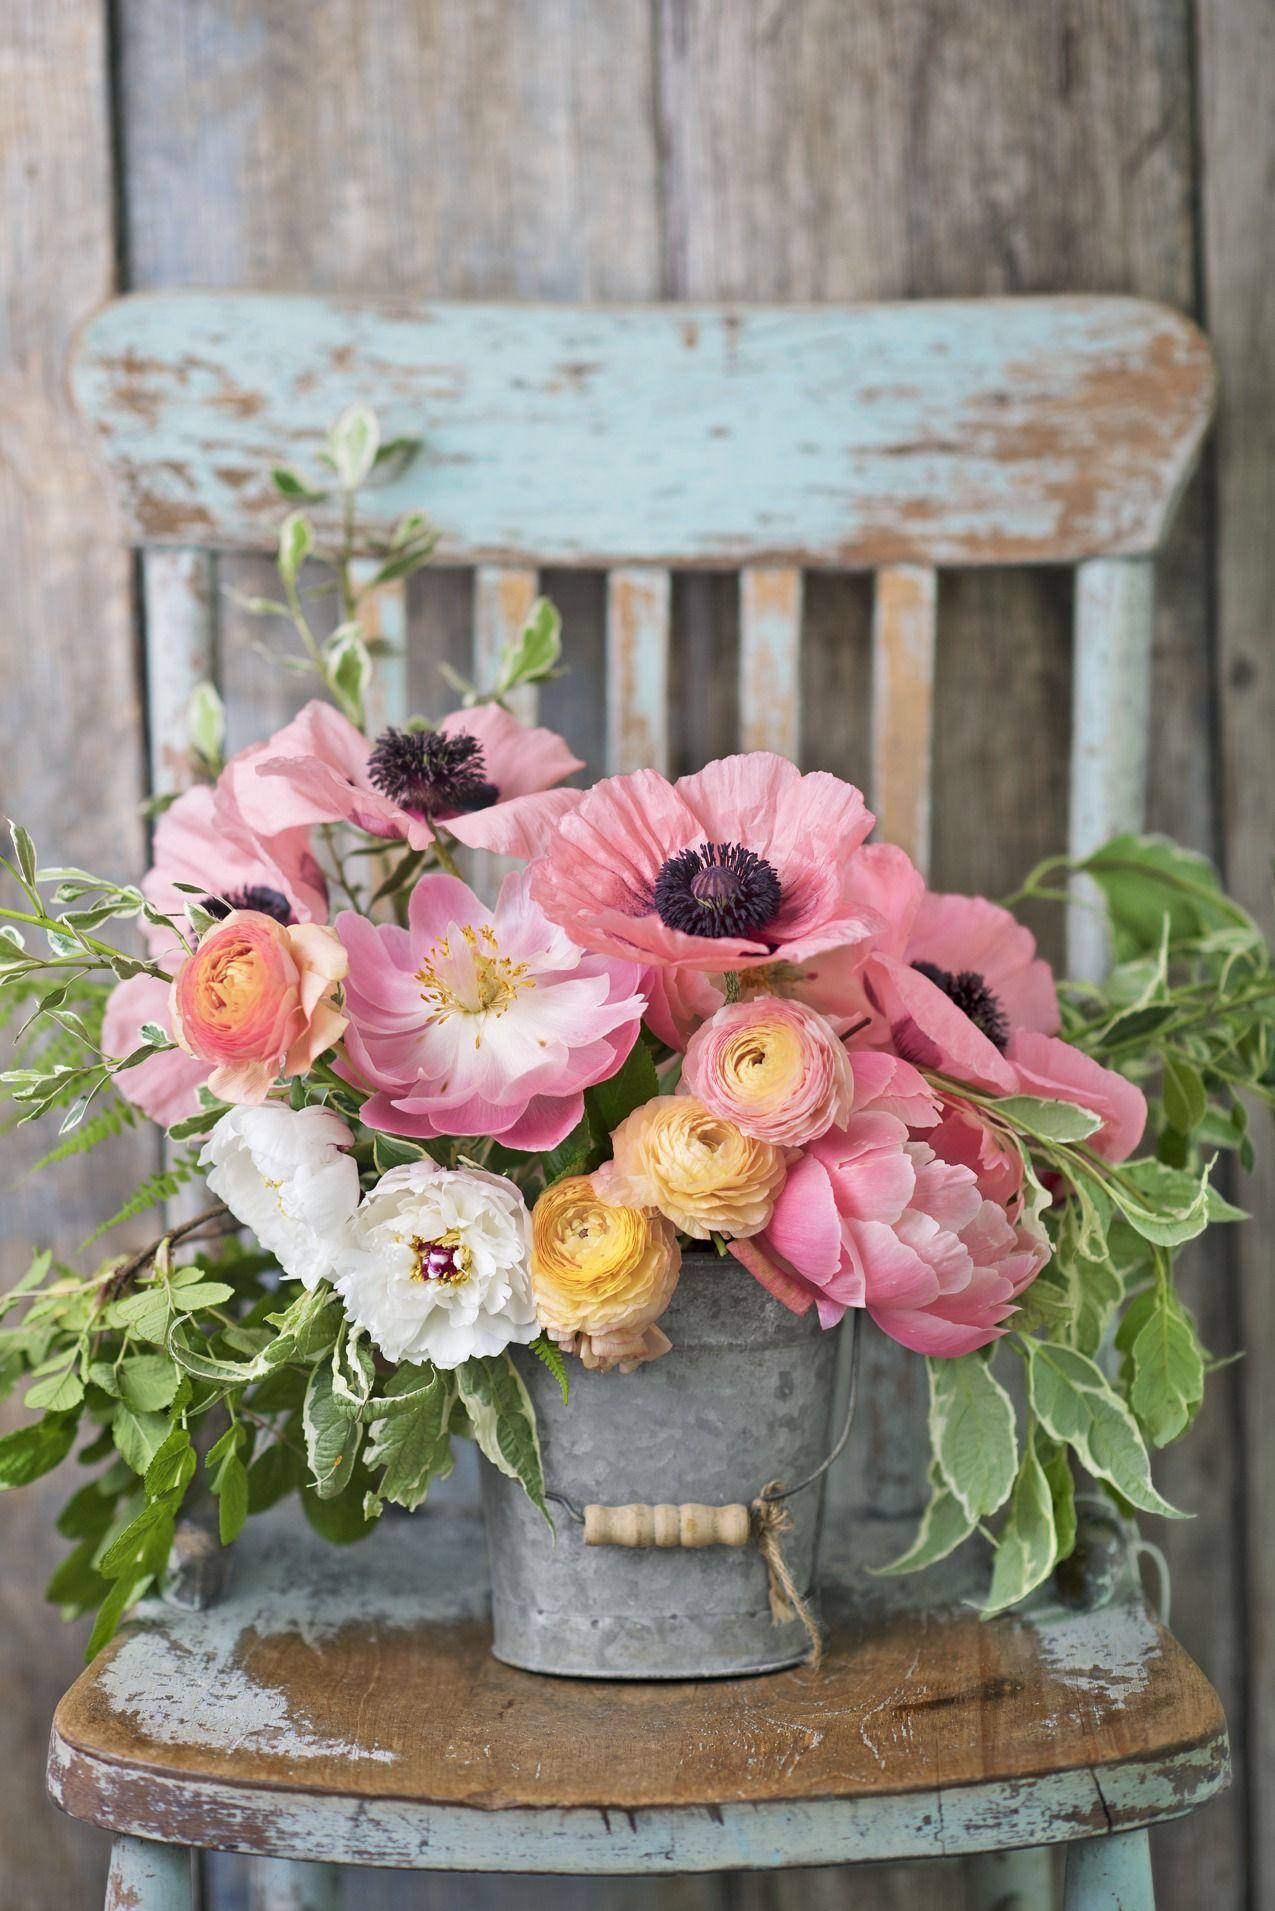 Best Easter Floral Centerpieces 20 Breathtaking Easter Flower Arrangements